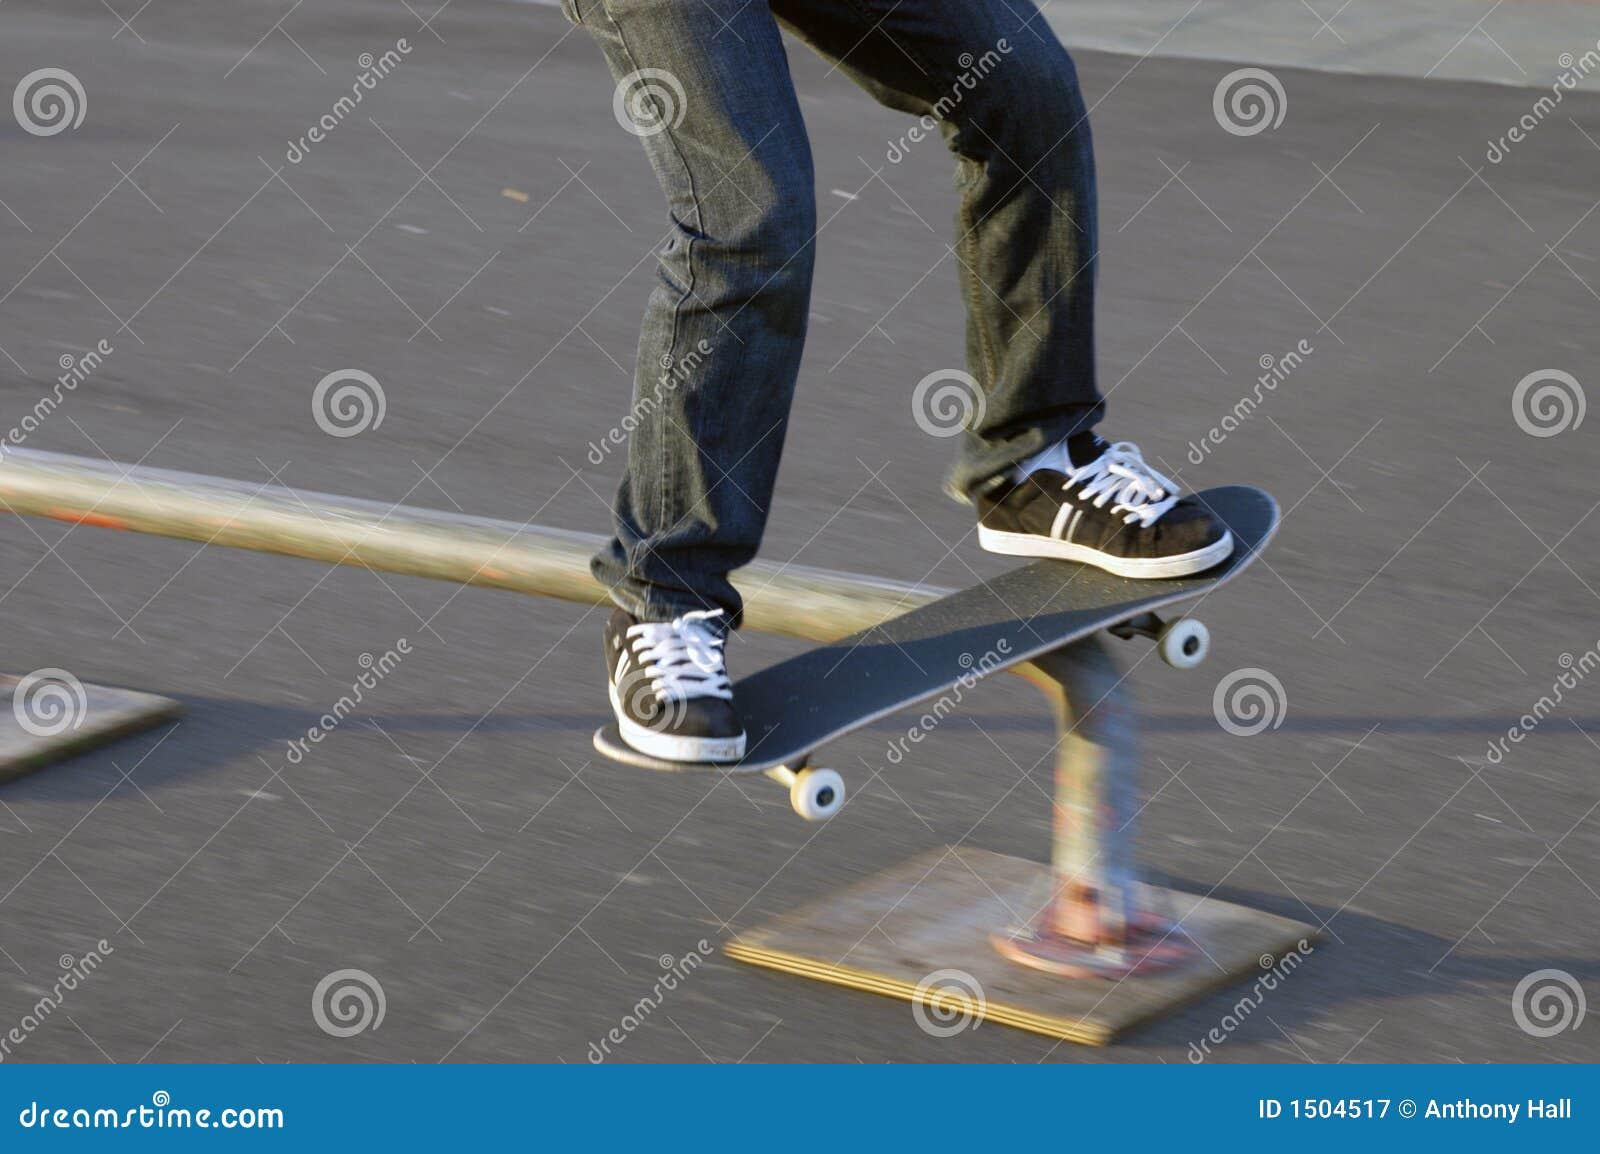 skateboard rail slide royalty free stock photography. Black Bedroom Furniture Sets. Home Design Ideas